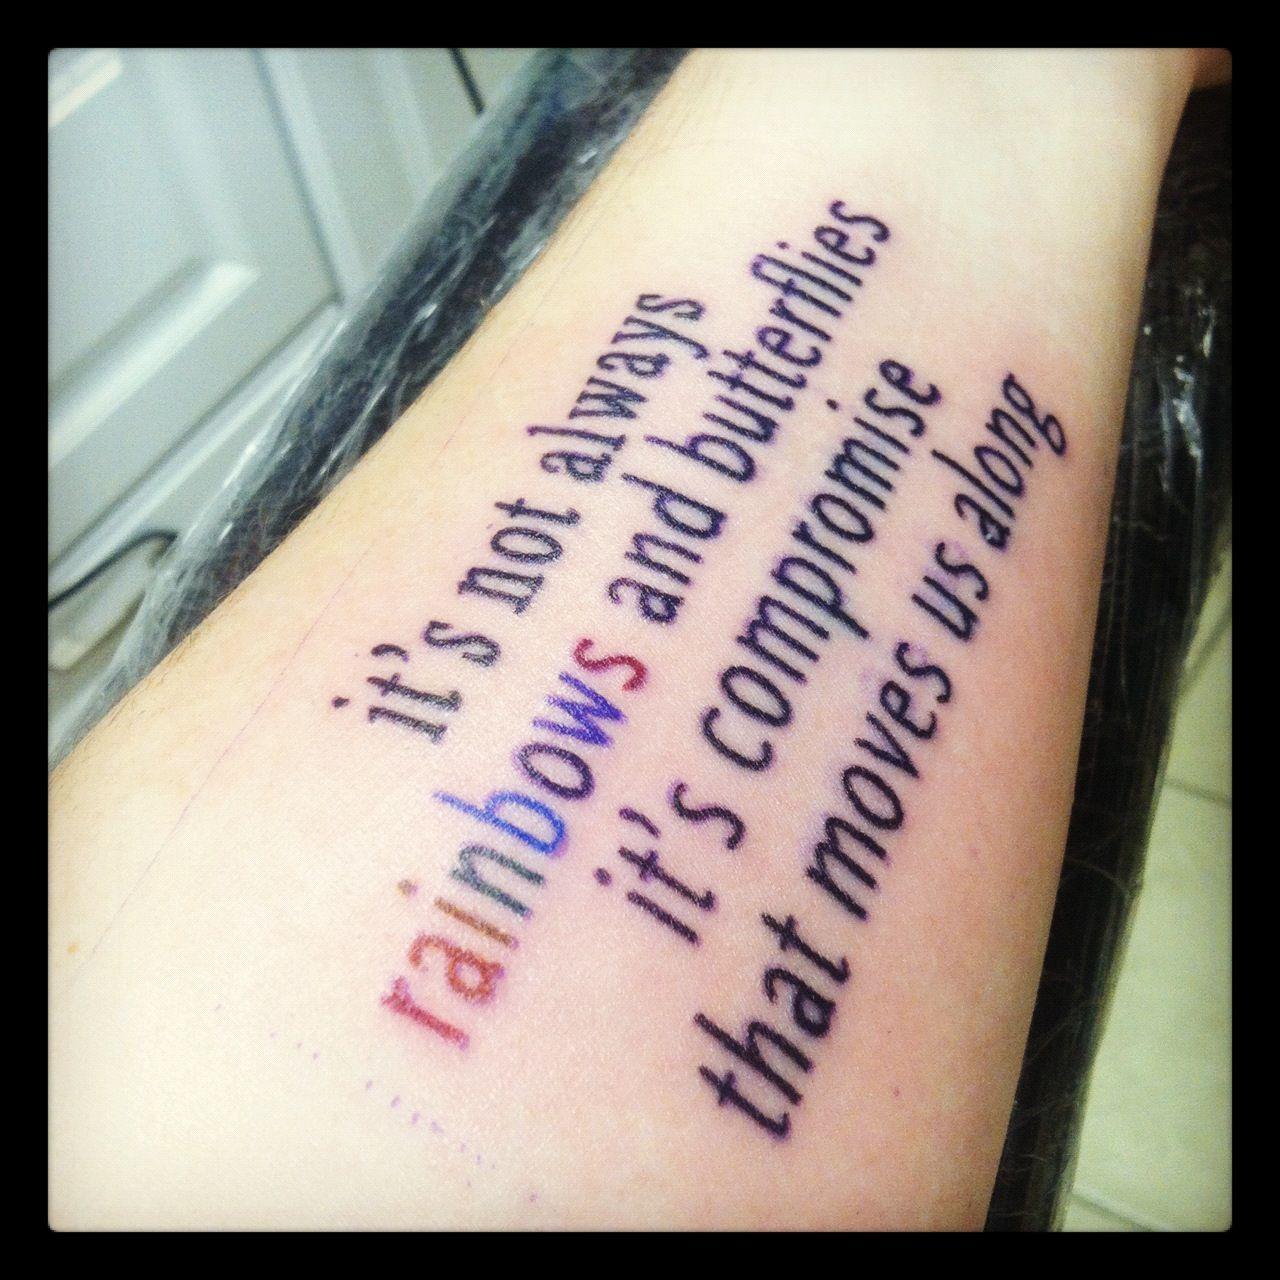 My new tattoo. Maroon 5 song lyrics. ) Song lyric